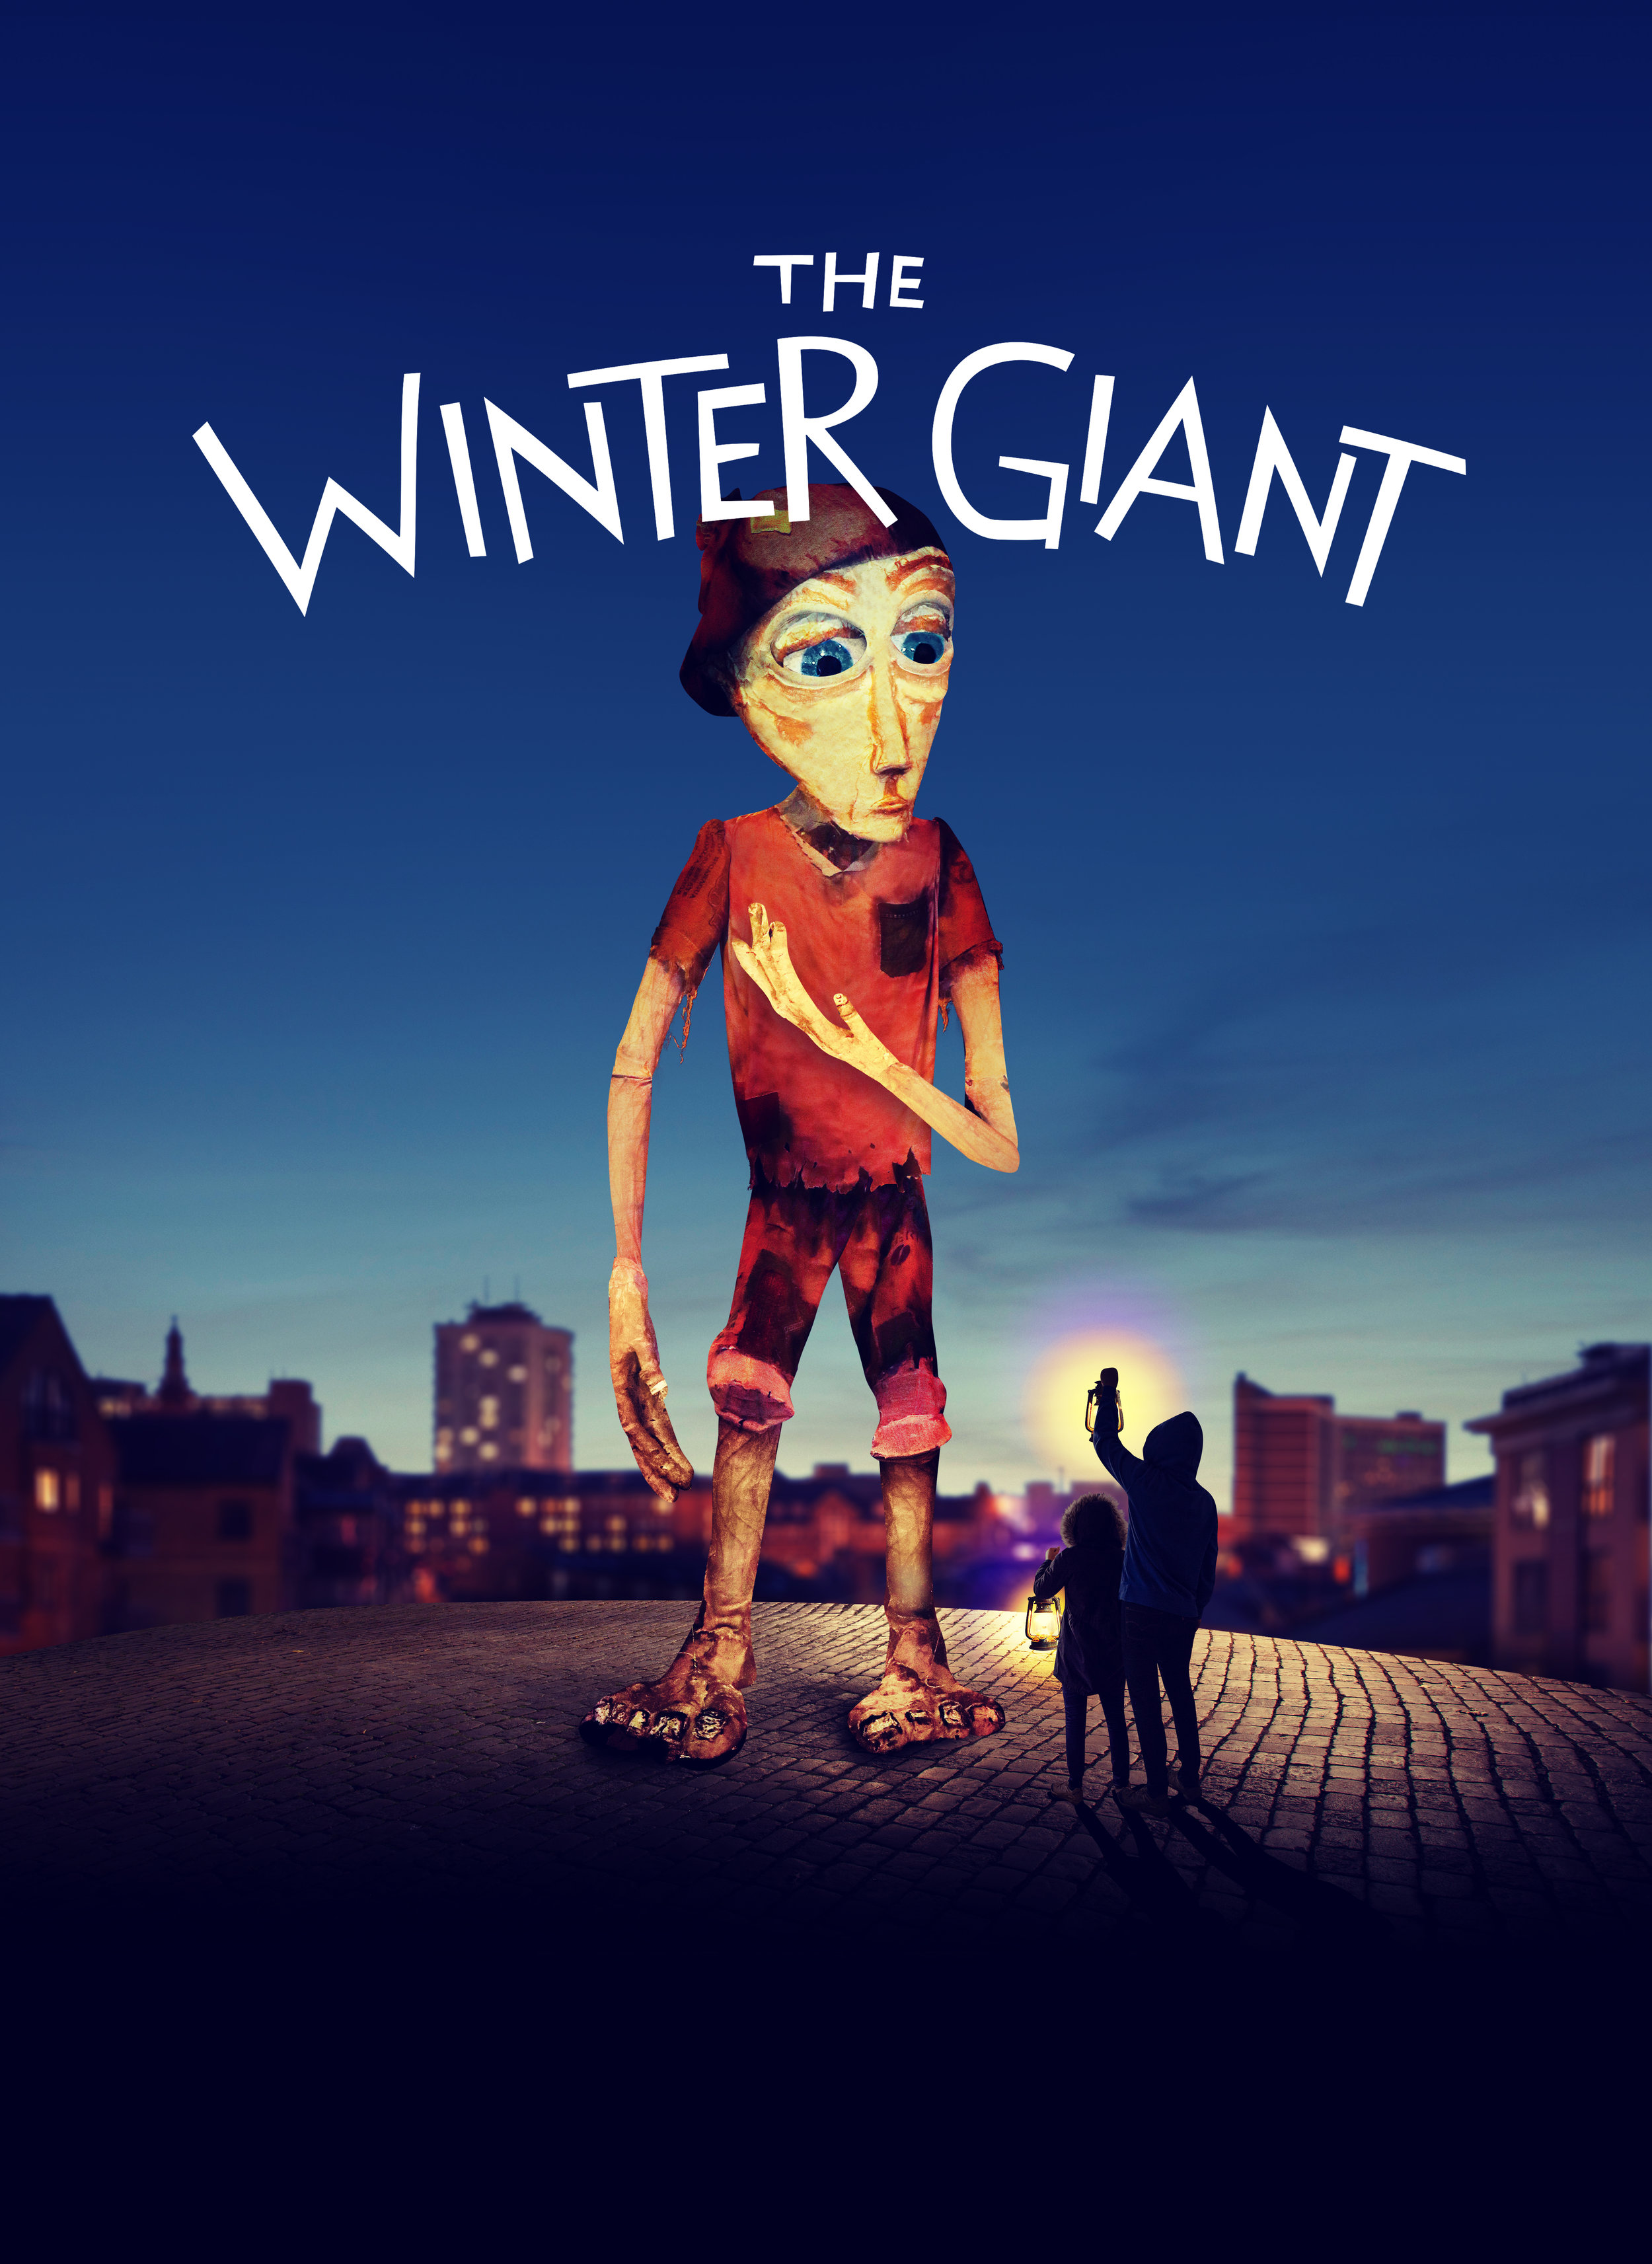 WinterGiant_Image.jpg